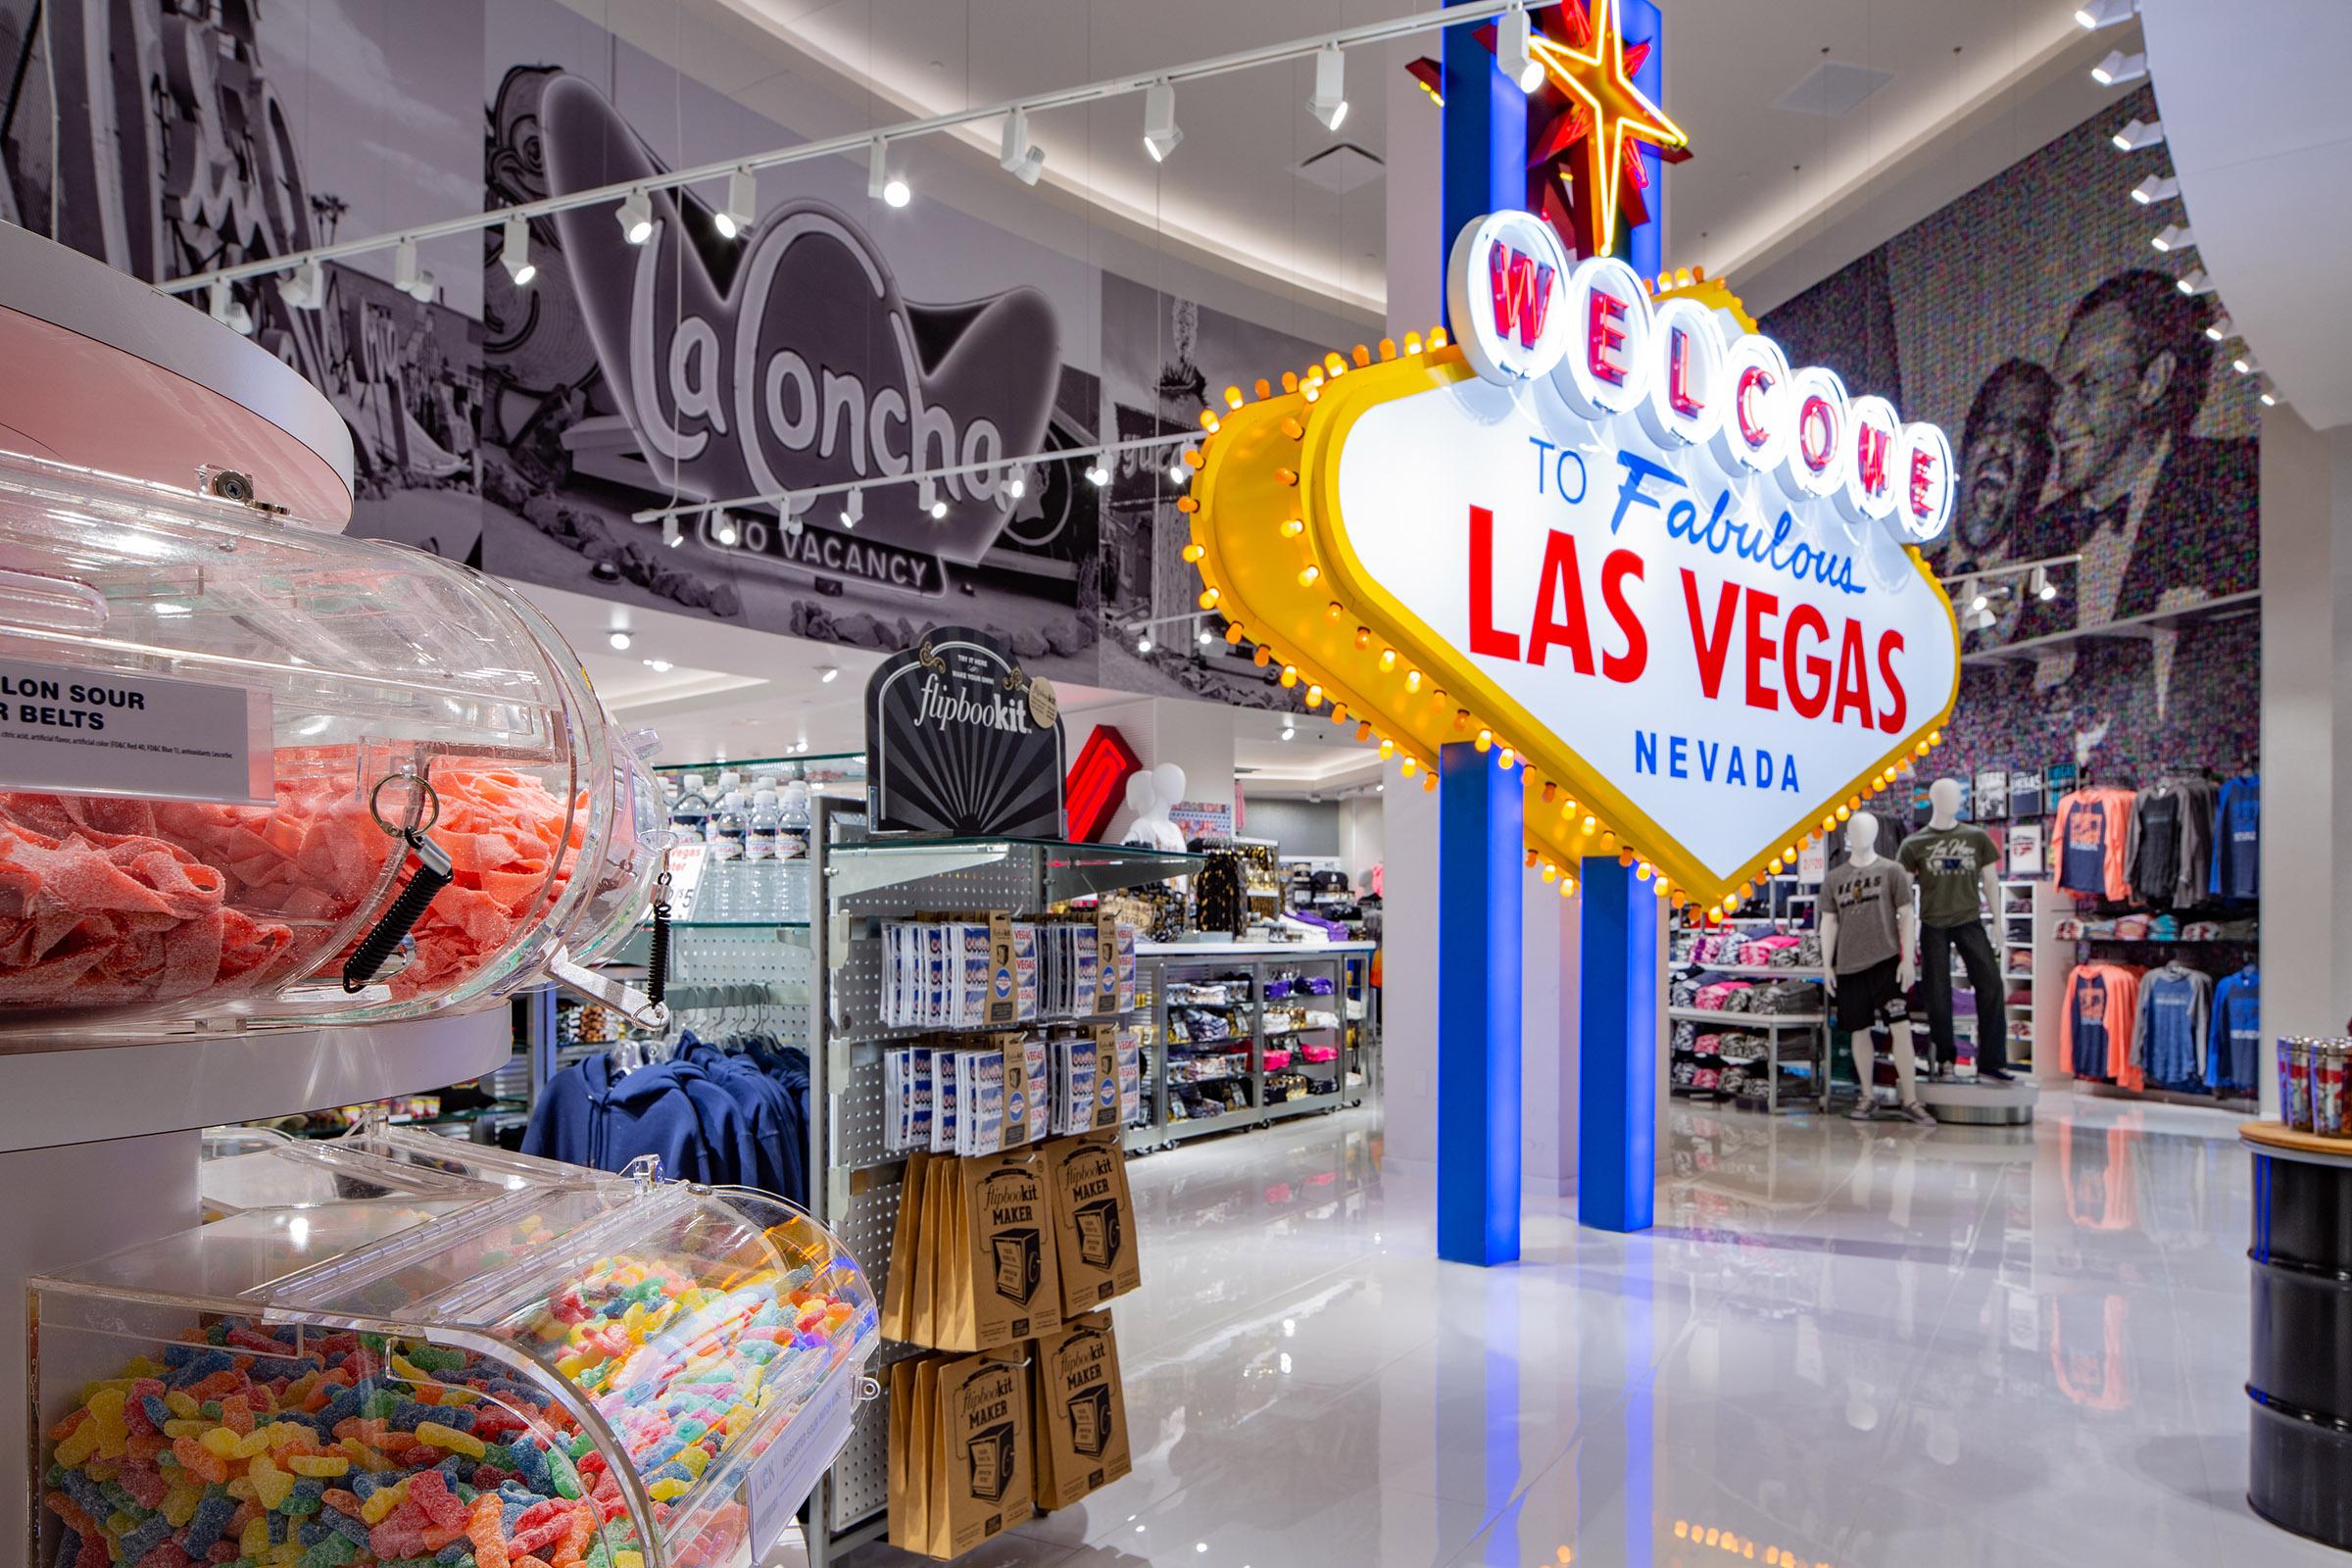 Welcome To Las Vegas Signage Lighting Merchandise